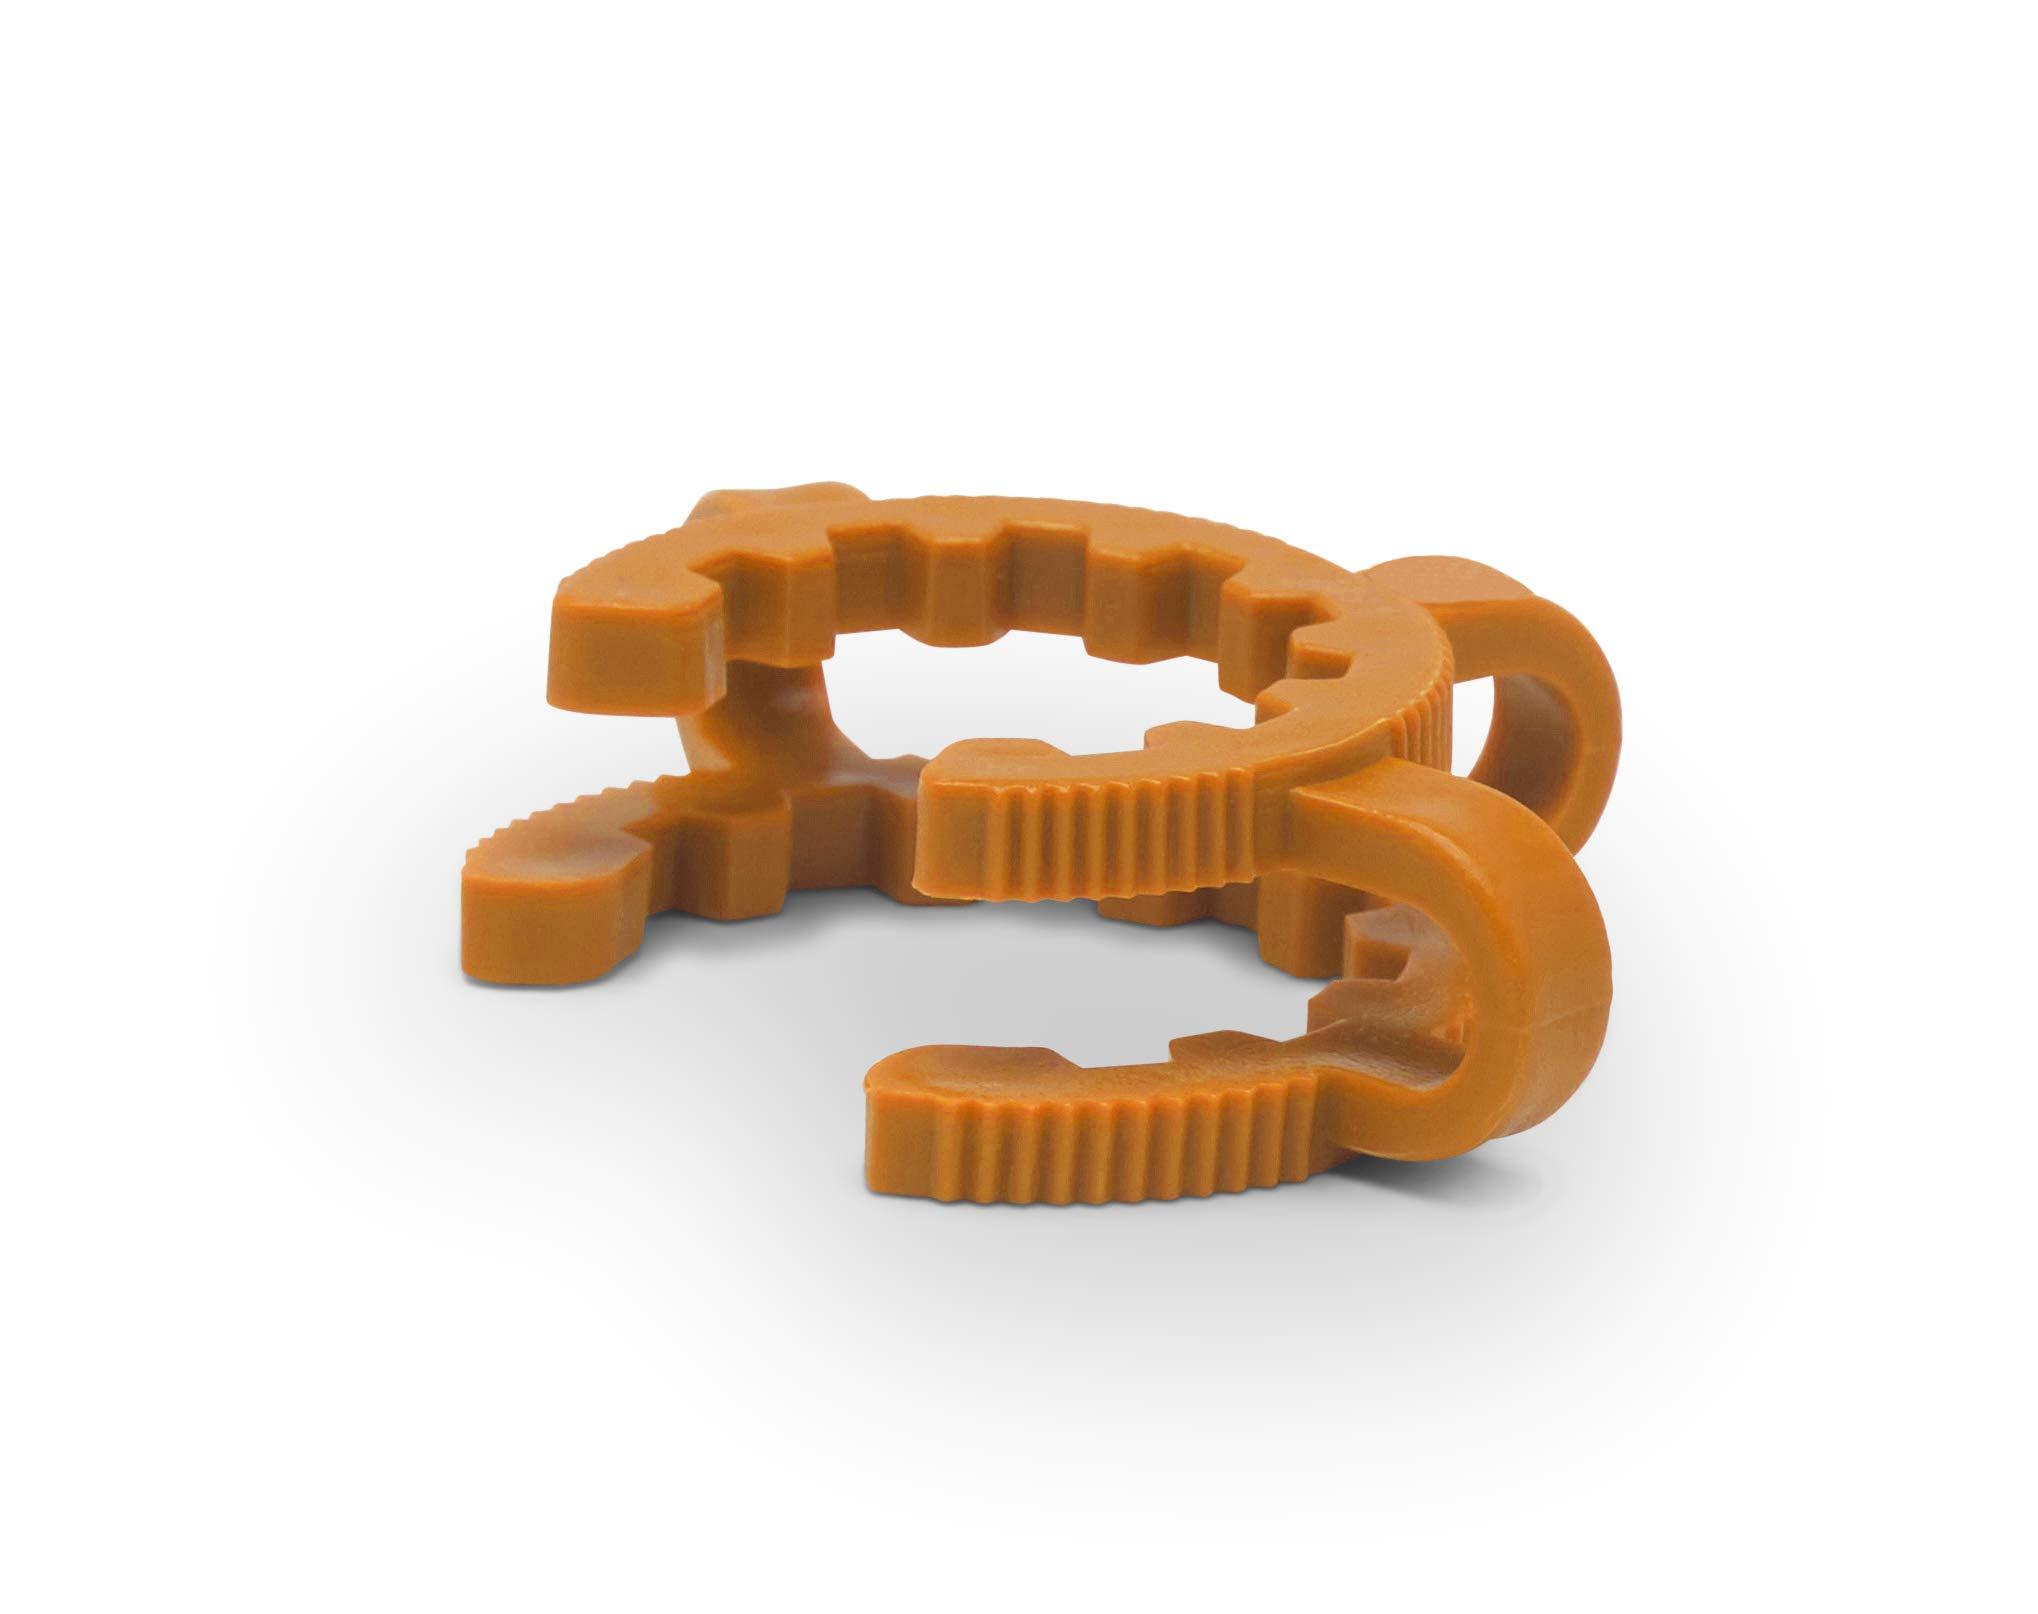 Goldleaf Scientific ACC034PK #34 Plastic Keck Clips (5-Pack) by Goldleaf Scientific